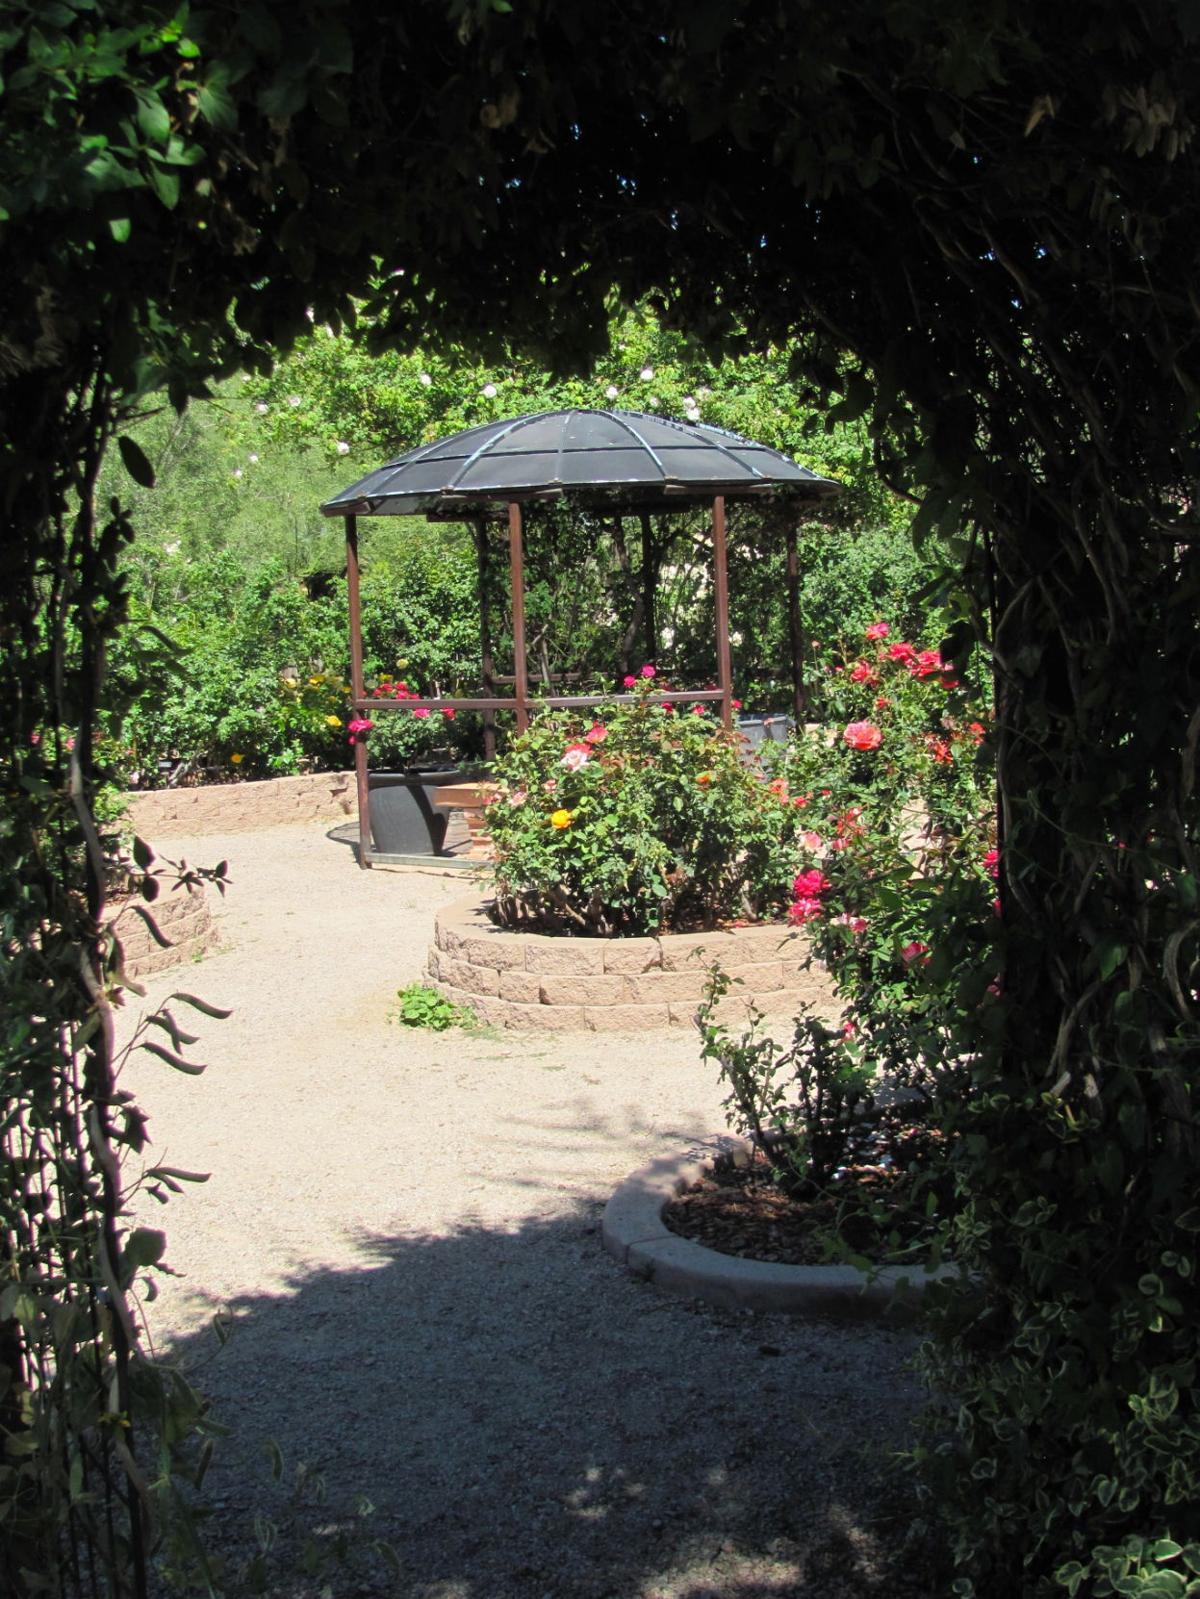 Inviting gardens